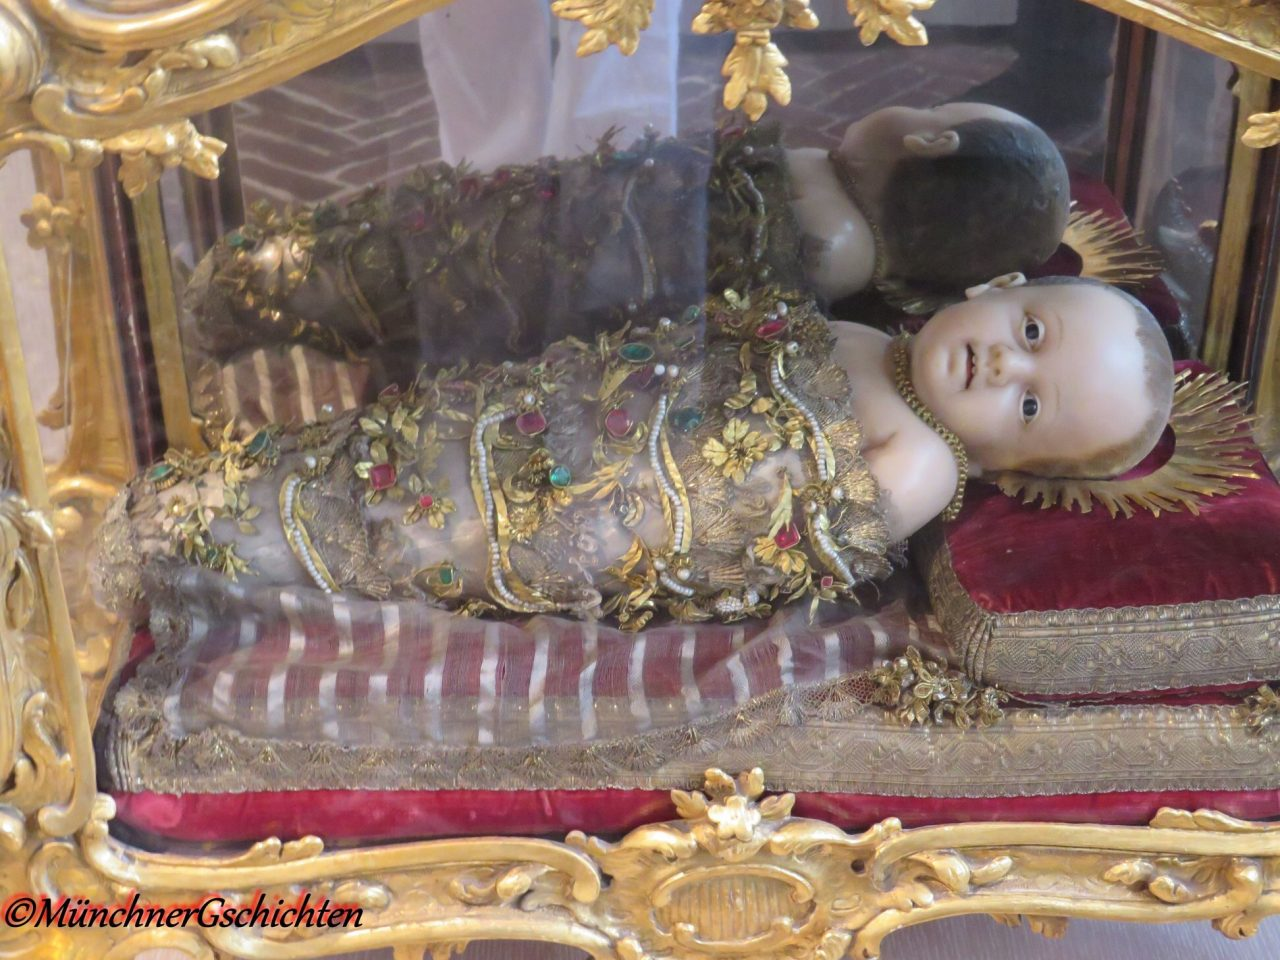 Life size baby Jesus. Munich Christmas miracle, Baby Jesus, Christkindl